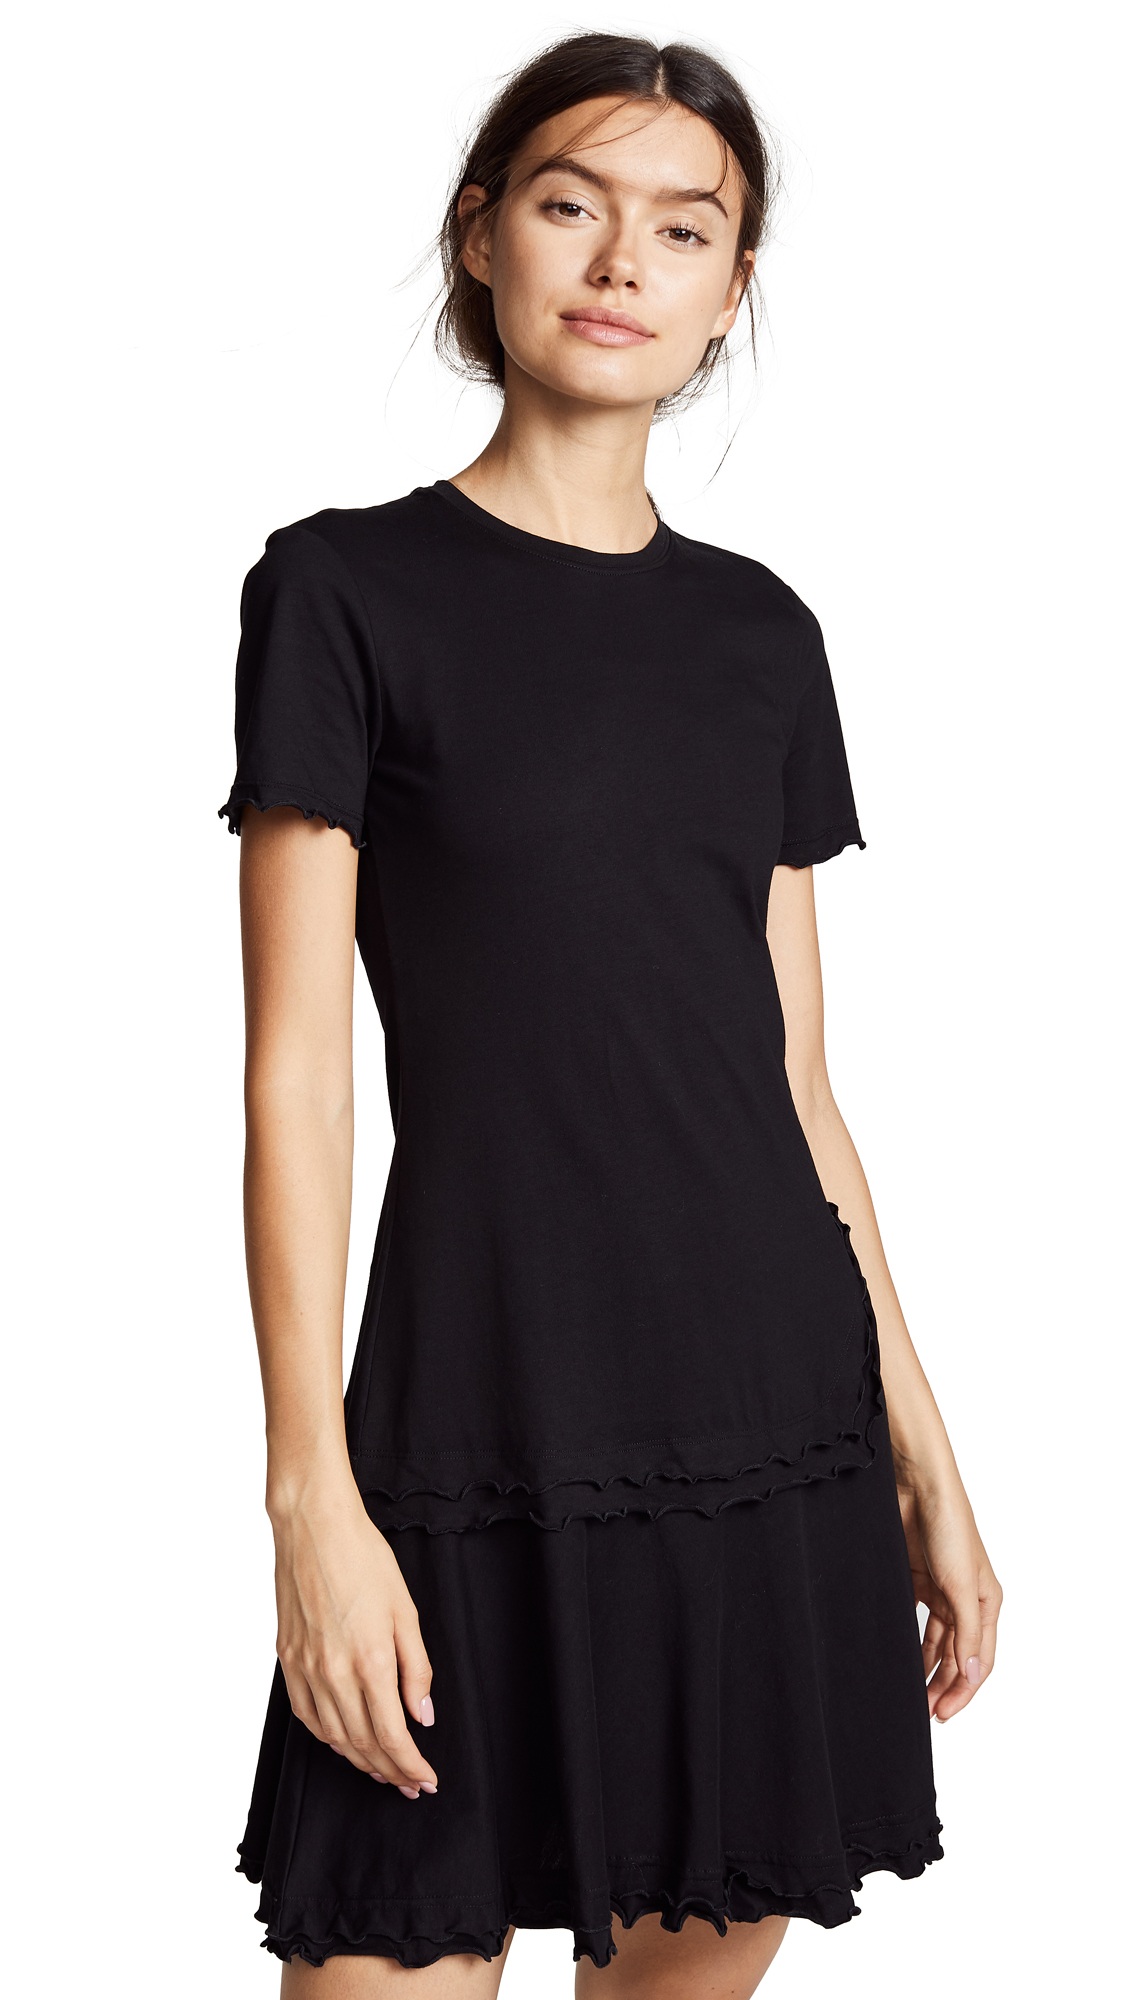 Derek Lam 10 Crosby Short Sleeve T-Shirt Dress In Black